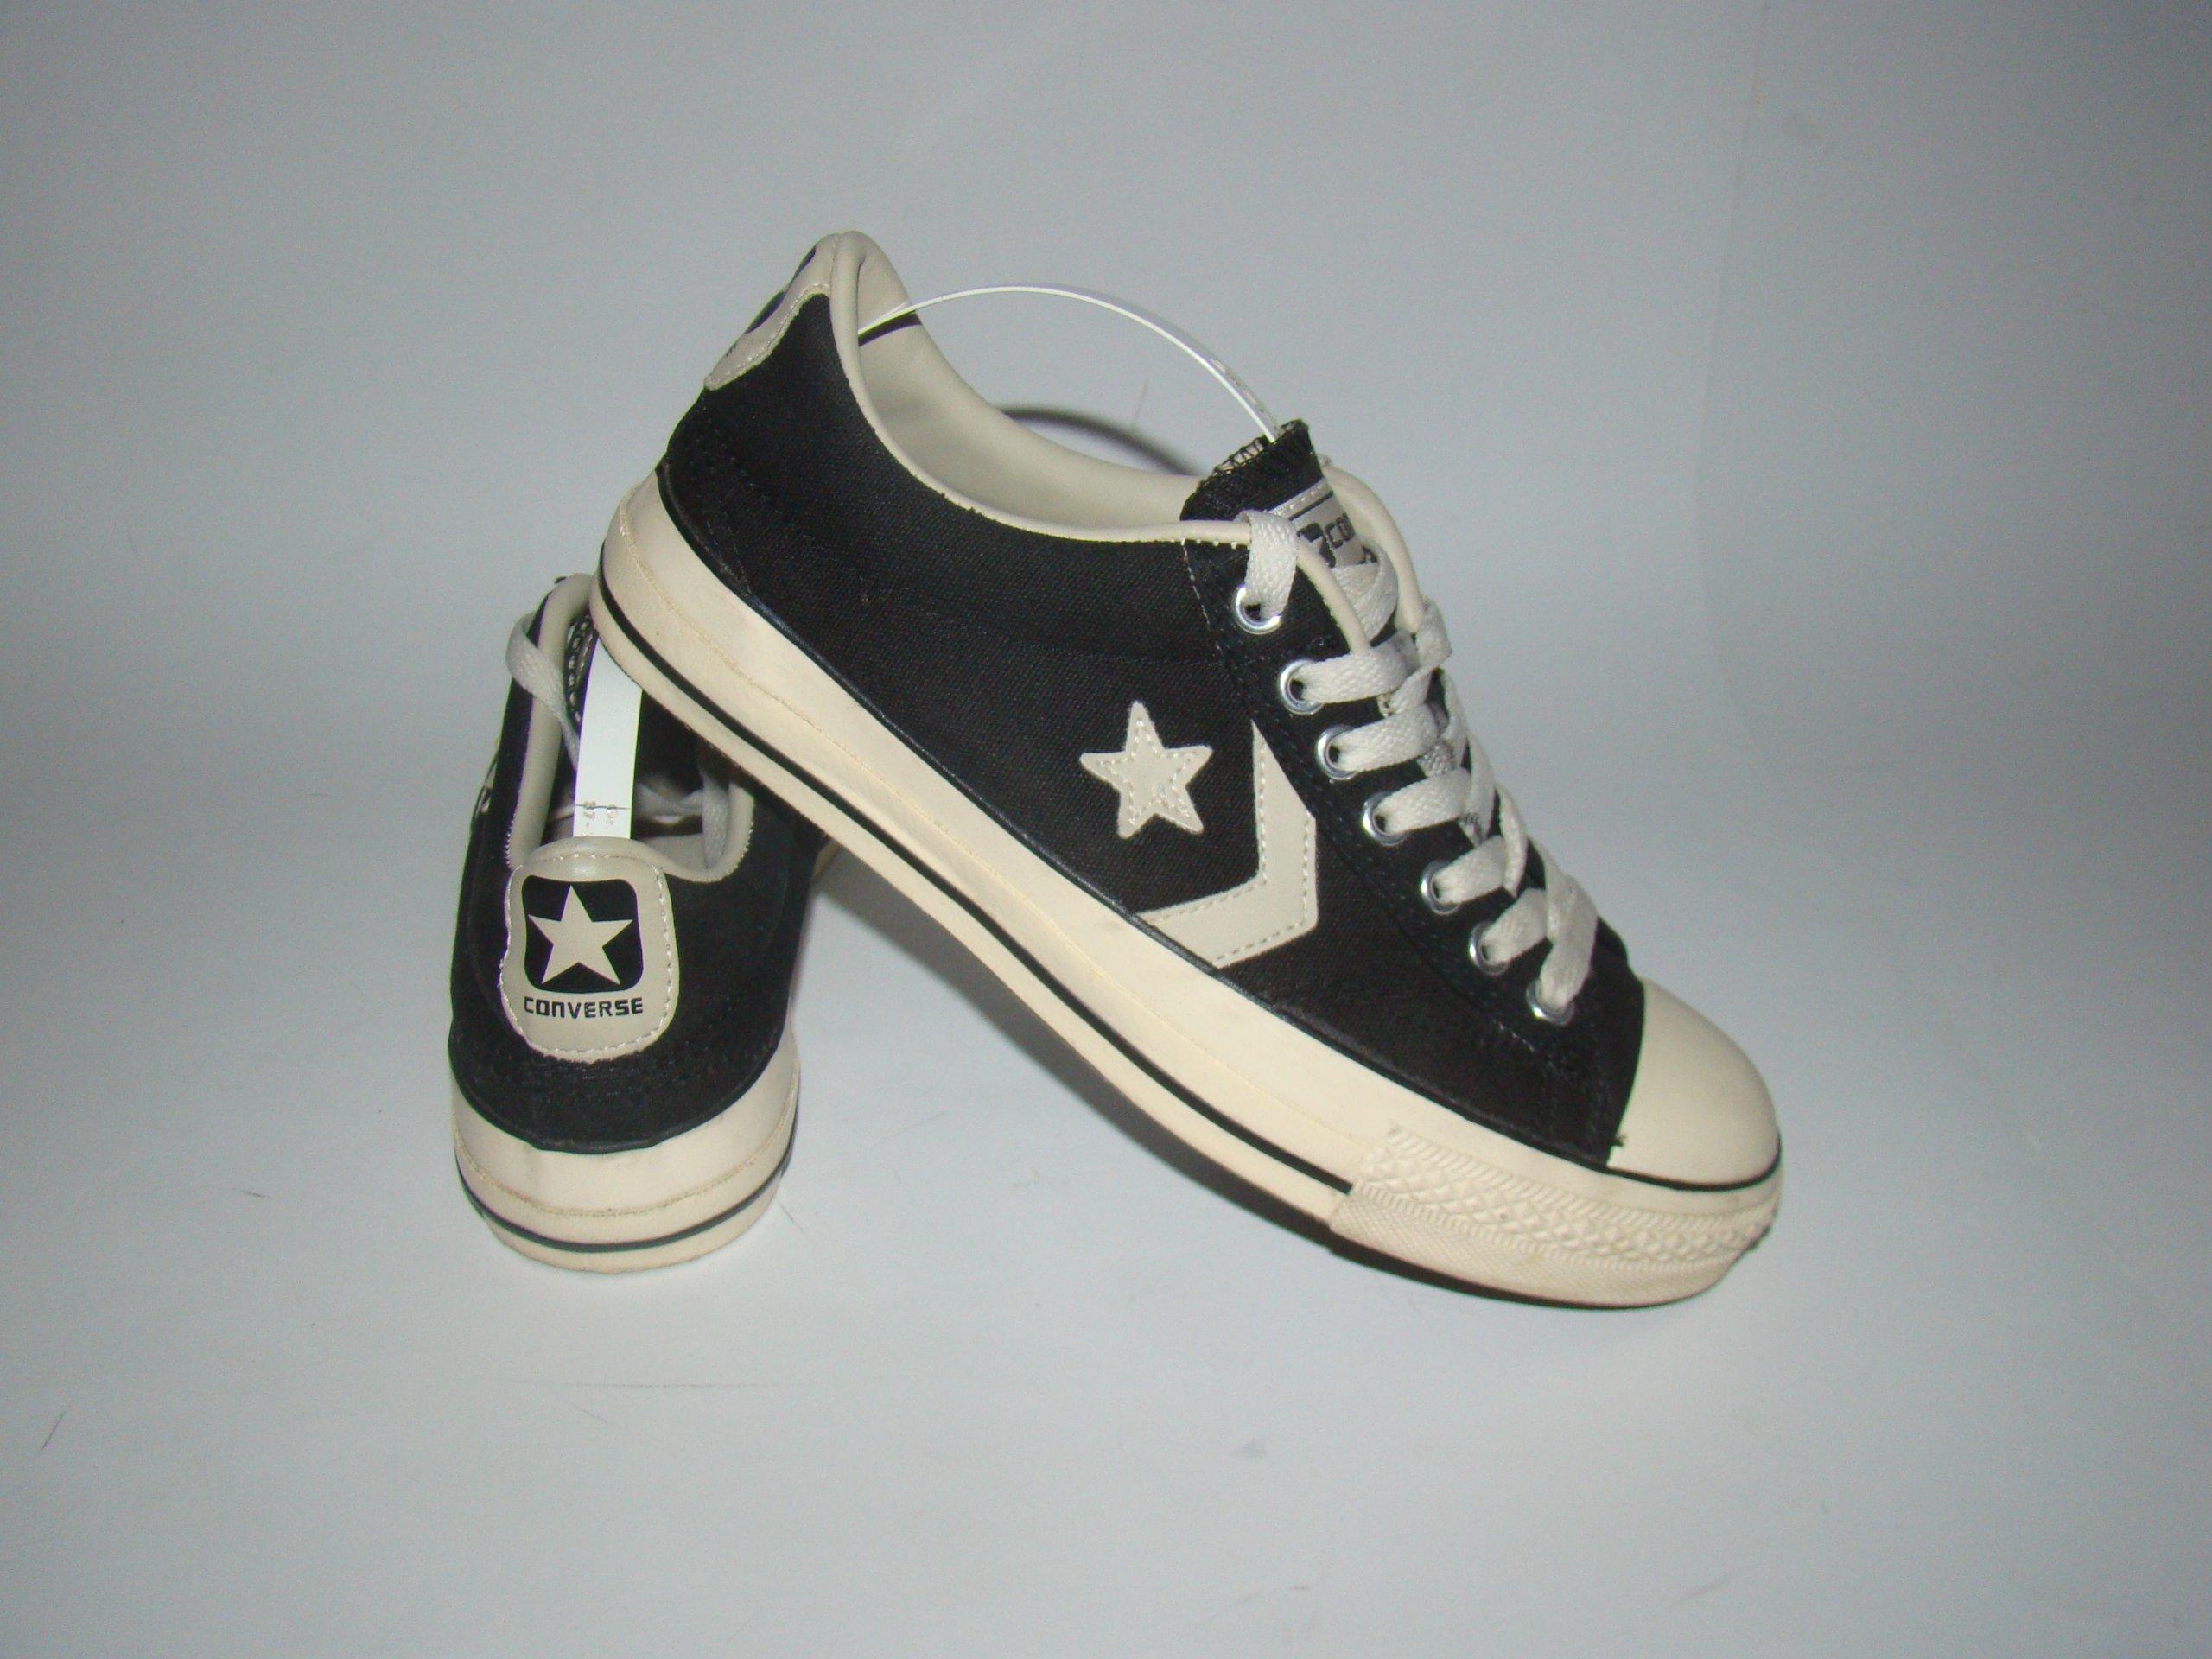 Trampki damskie converse ct all star m7652 37,5 Zdjęcie